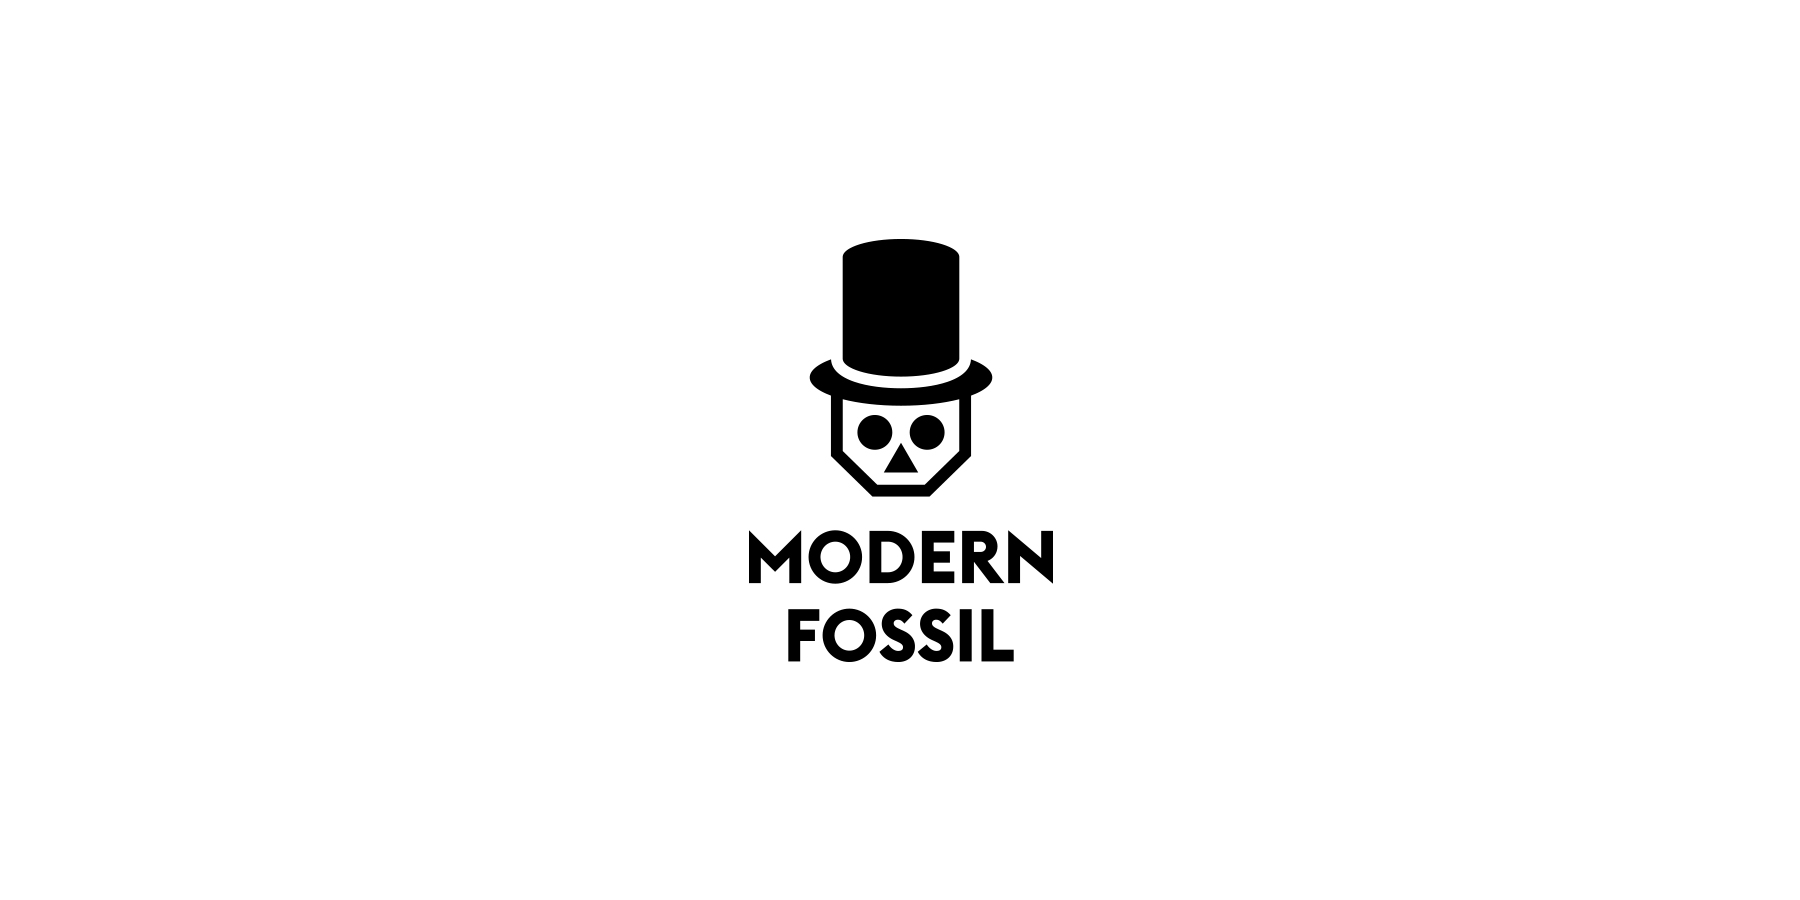 modern-fossil-logo-design-01